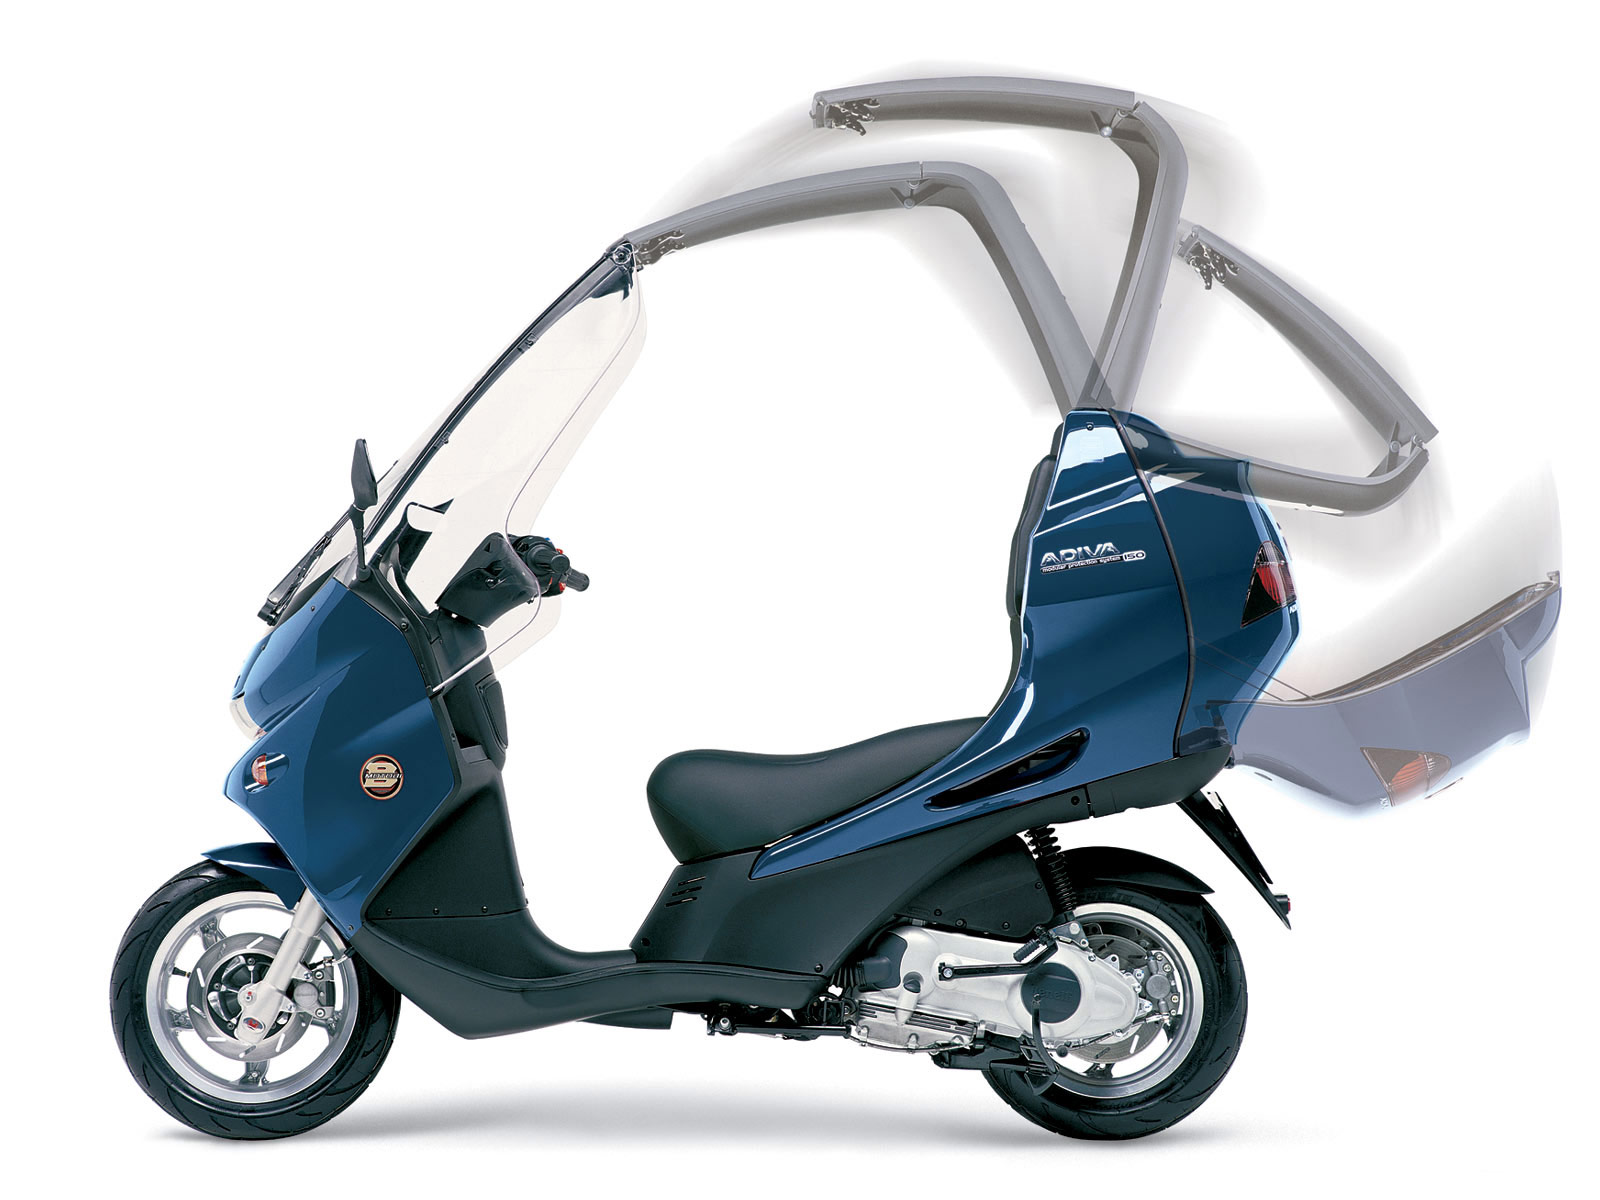 2004 motobi adiva scooter pictures insurance  rmations